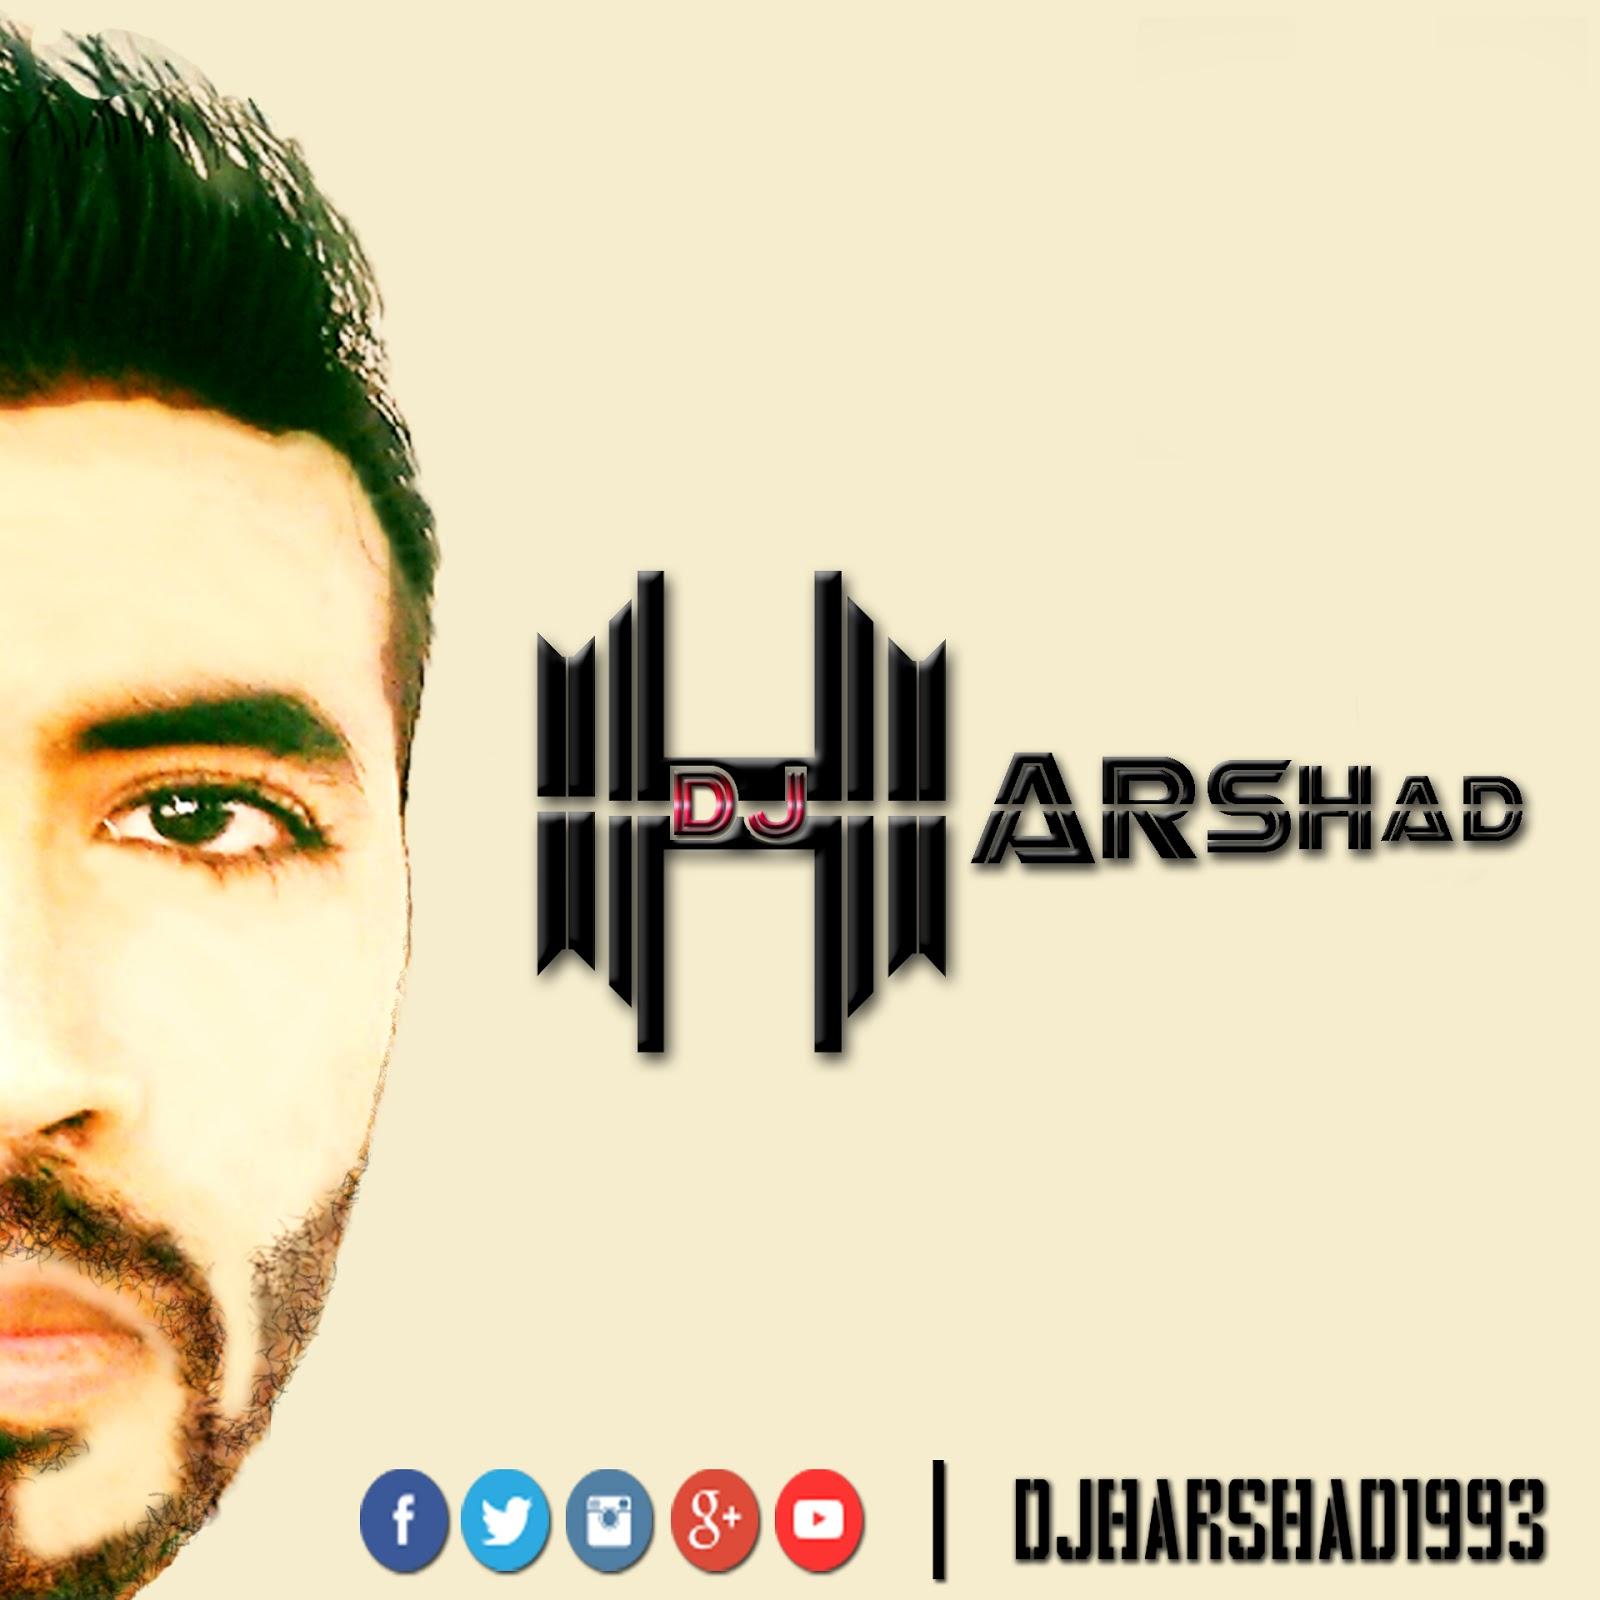 Ek Samay Mai To Tera Dj Song Download: DJ Harshad